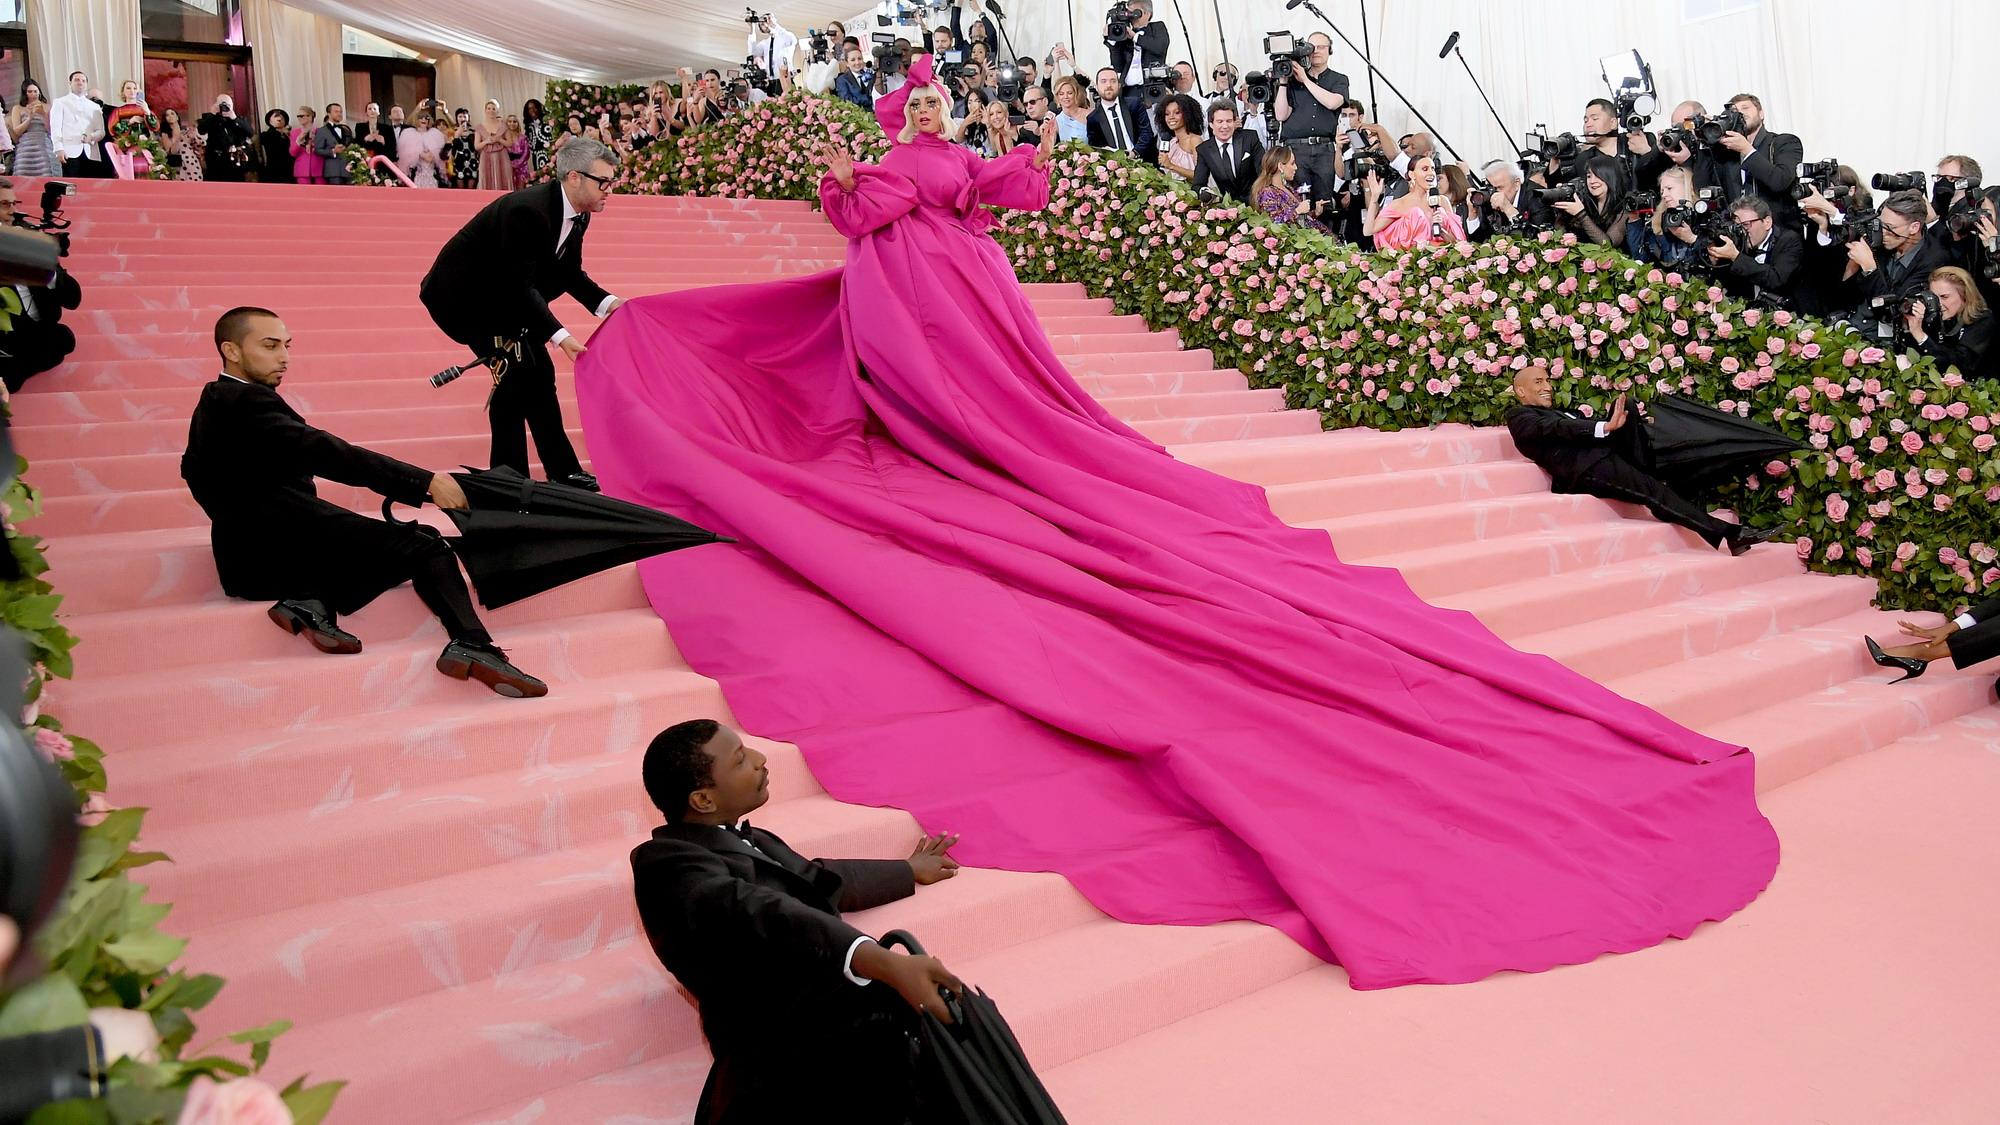 <b>纽约时尚庆典Lady Gaga太性感 黑人小哥表情亮了</b>